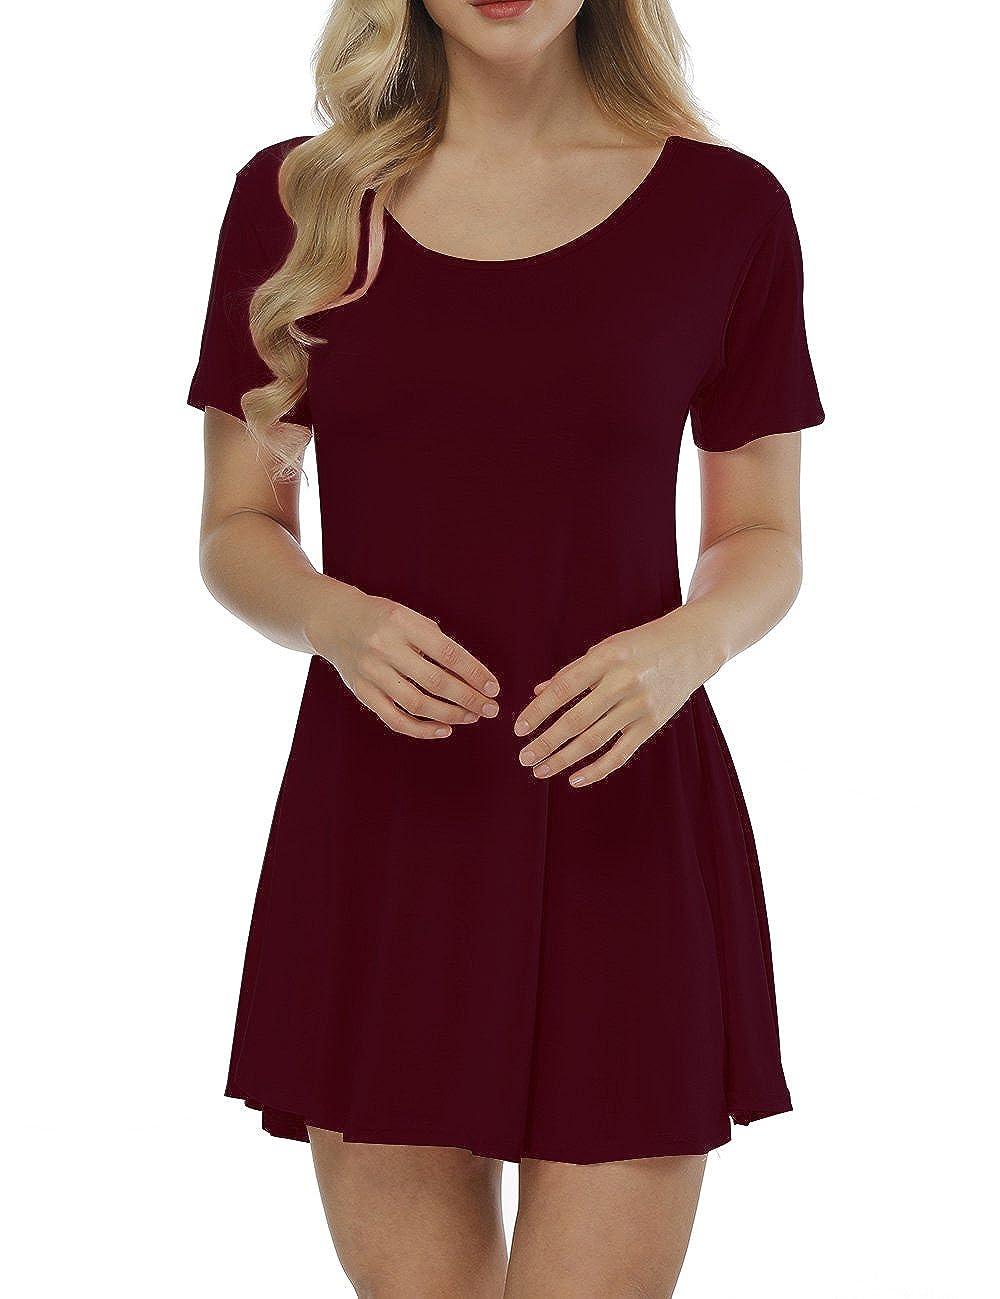 Haola Women Tunic Tops Summer Casual Loose Short Sleeve Plain Flowy